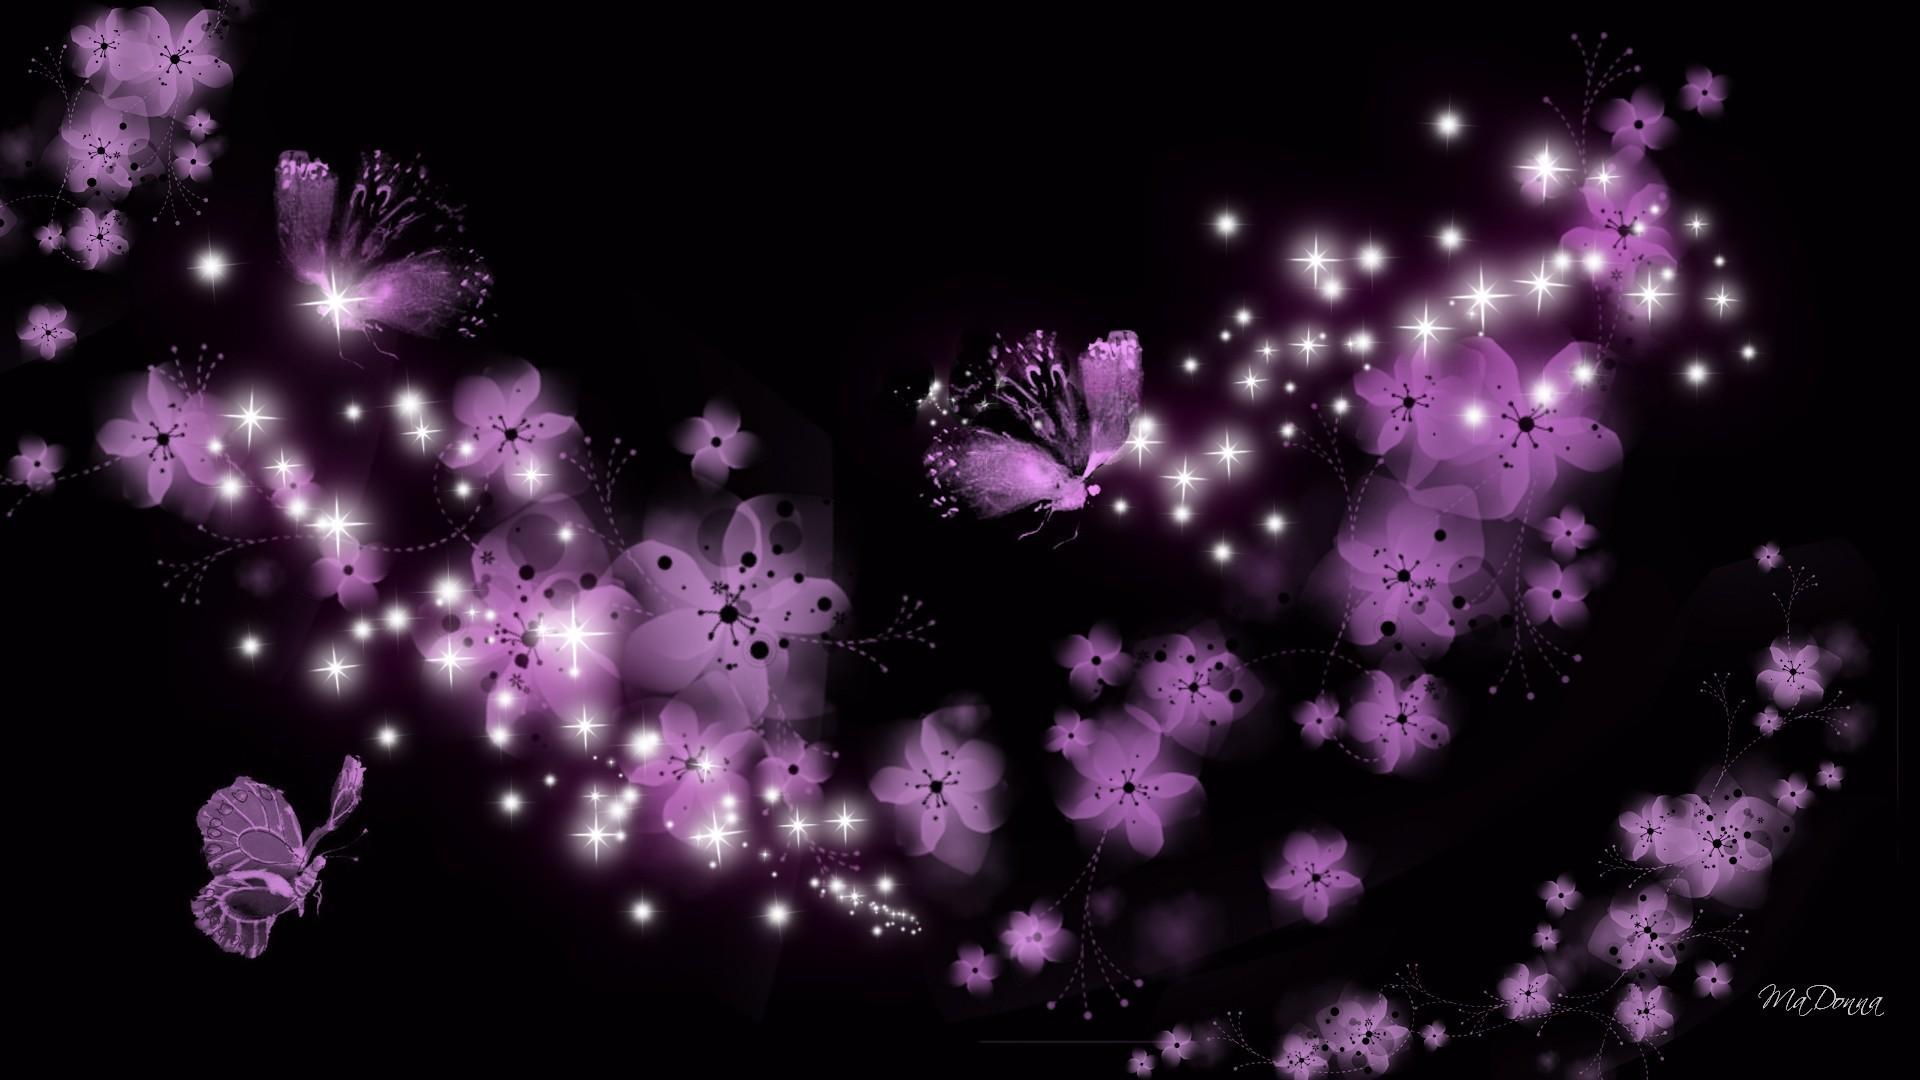 japanese cherry blossom wallpapers hd – ALOjamiento de IMágenes